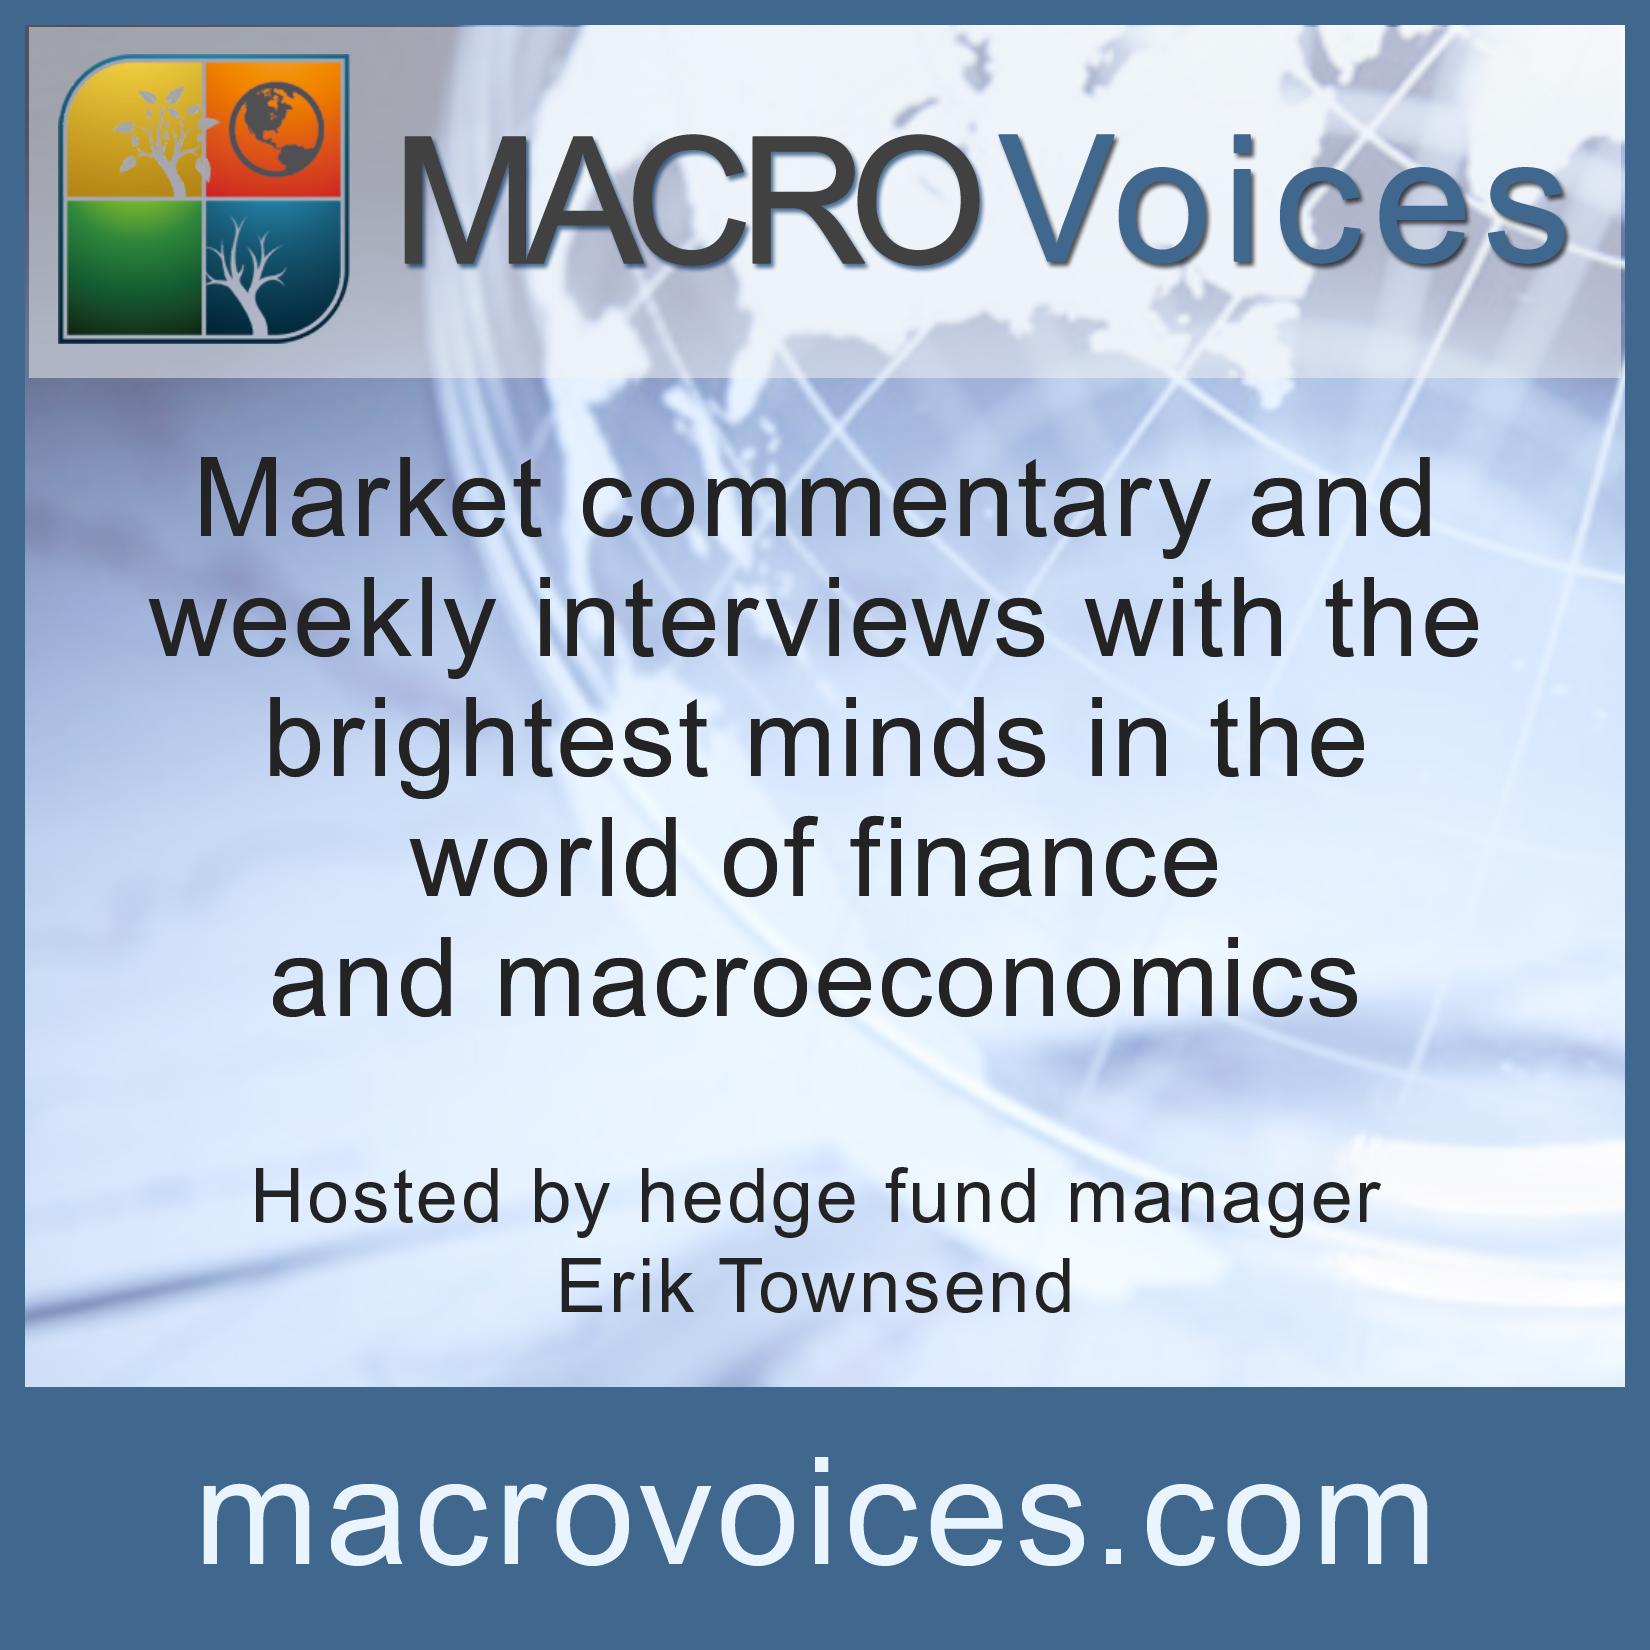 Macro_Voices_cover.jpg